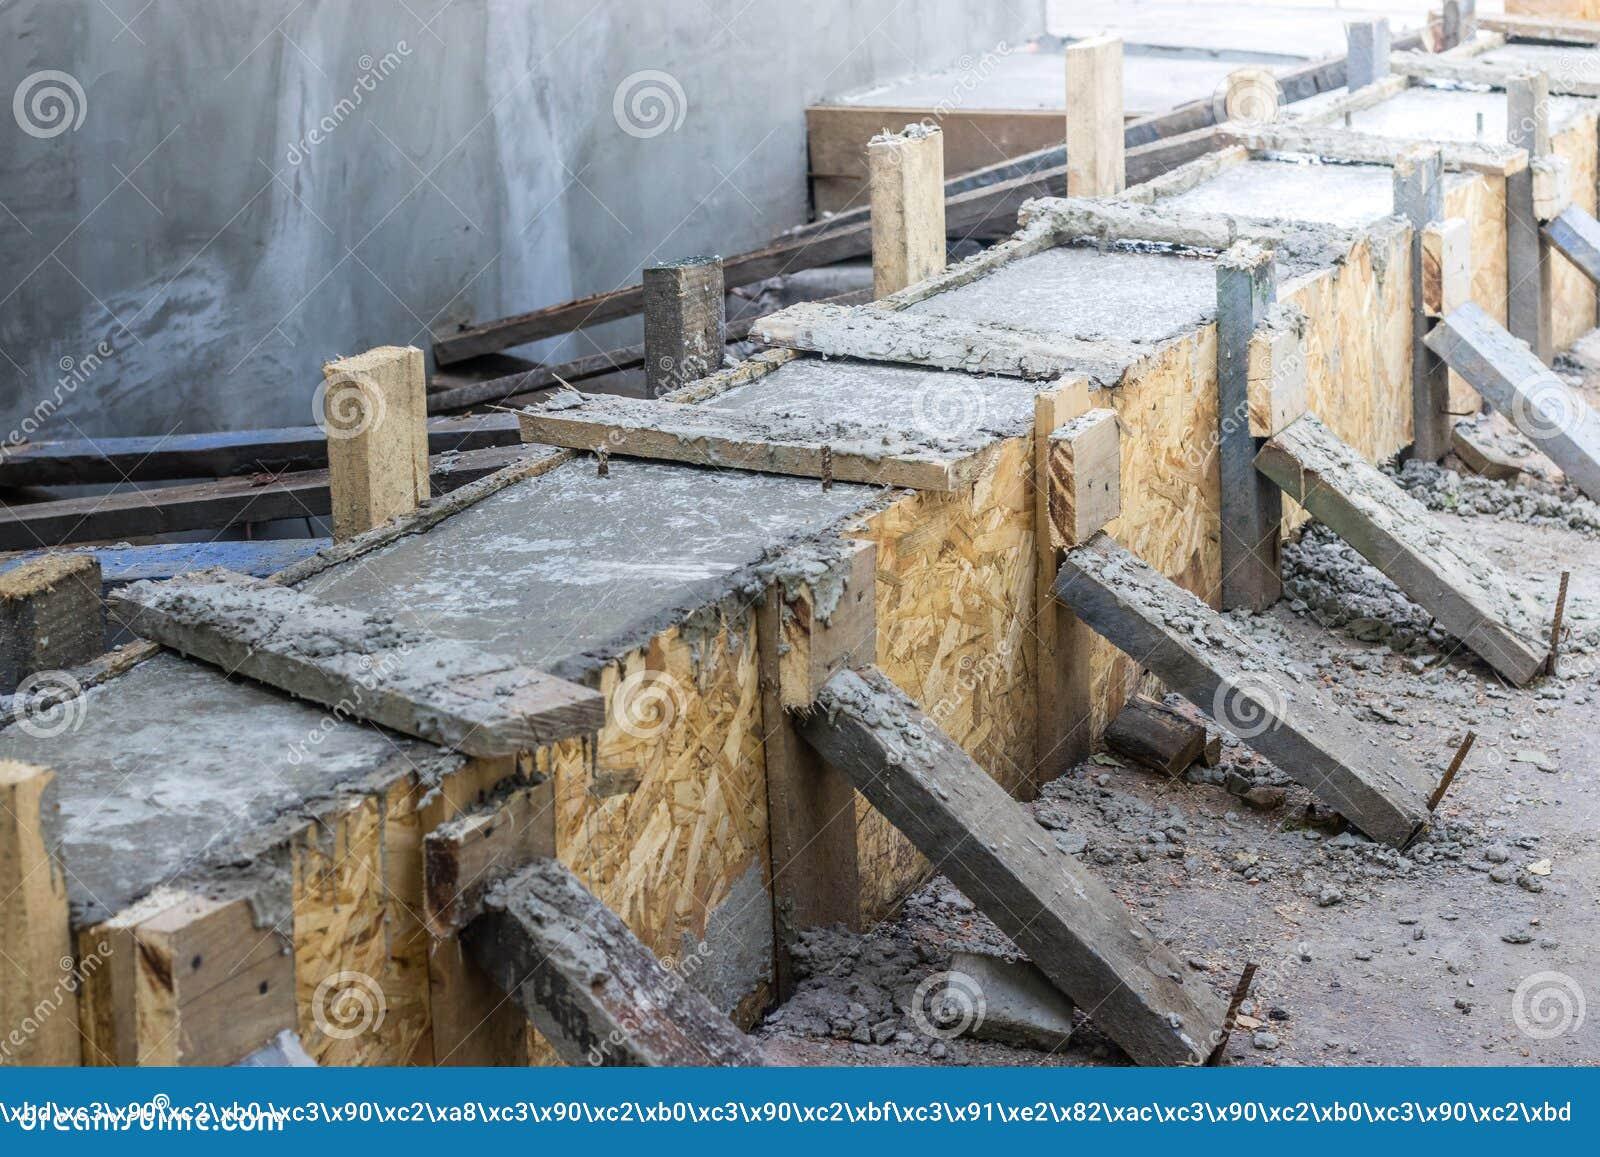 Бетон произведения купить бетон для фундамента с доставкой цена в брянске